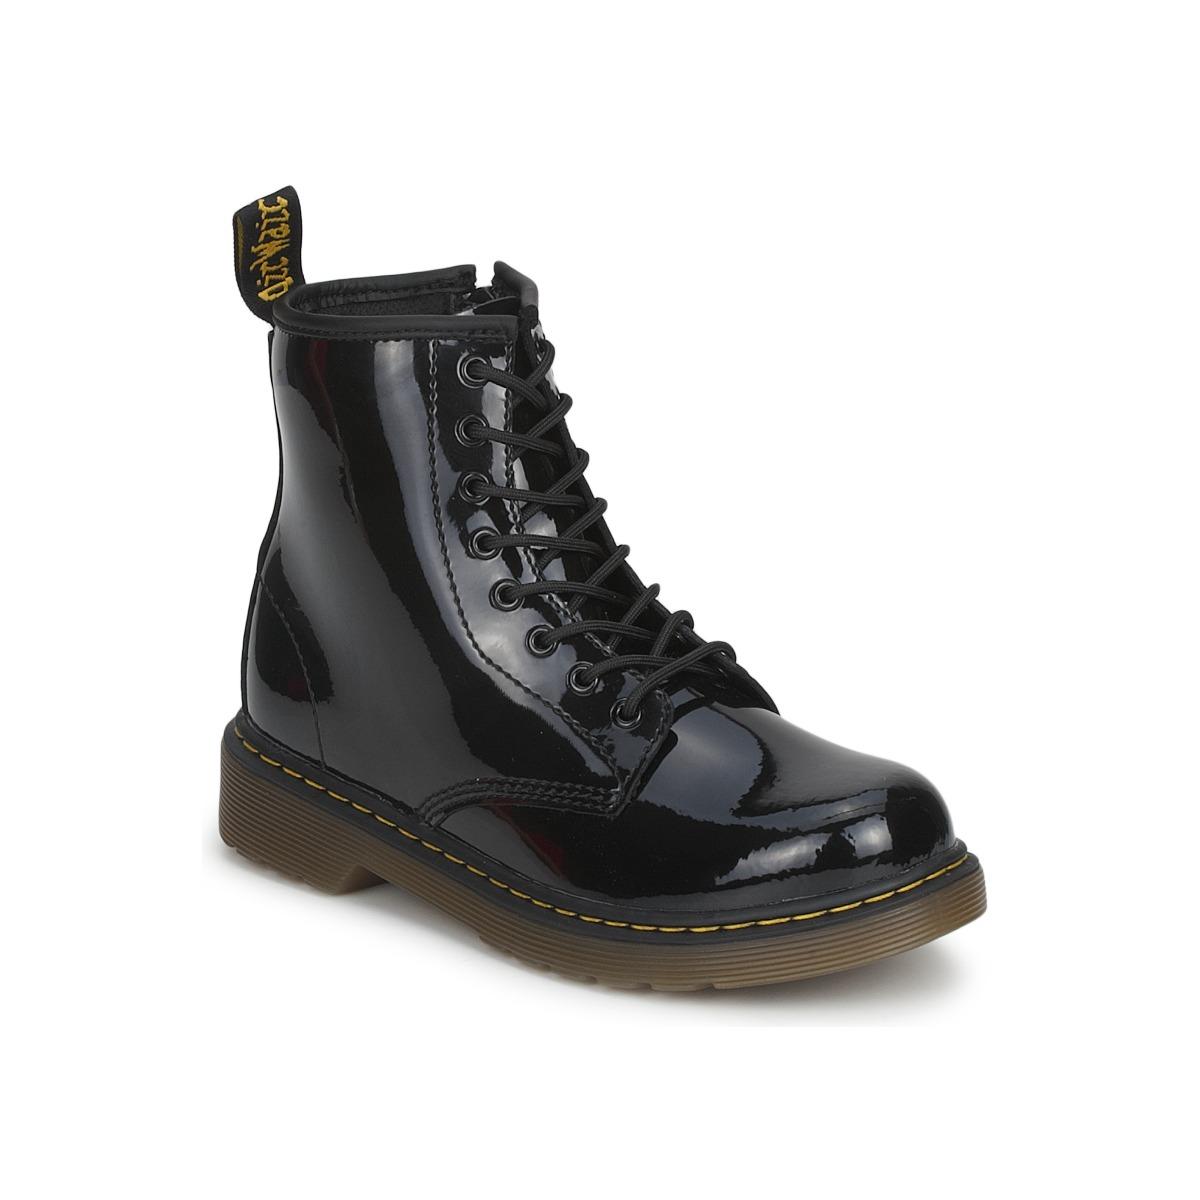 chaussure fille style doc martens. Black Bedroom Furniture Sets. Home Design Ideas